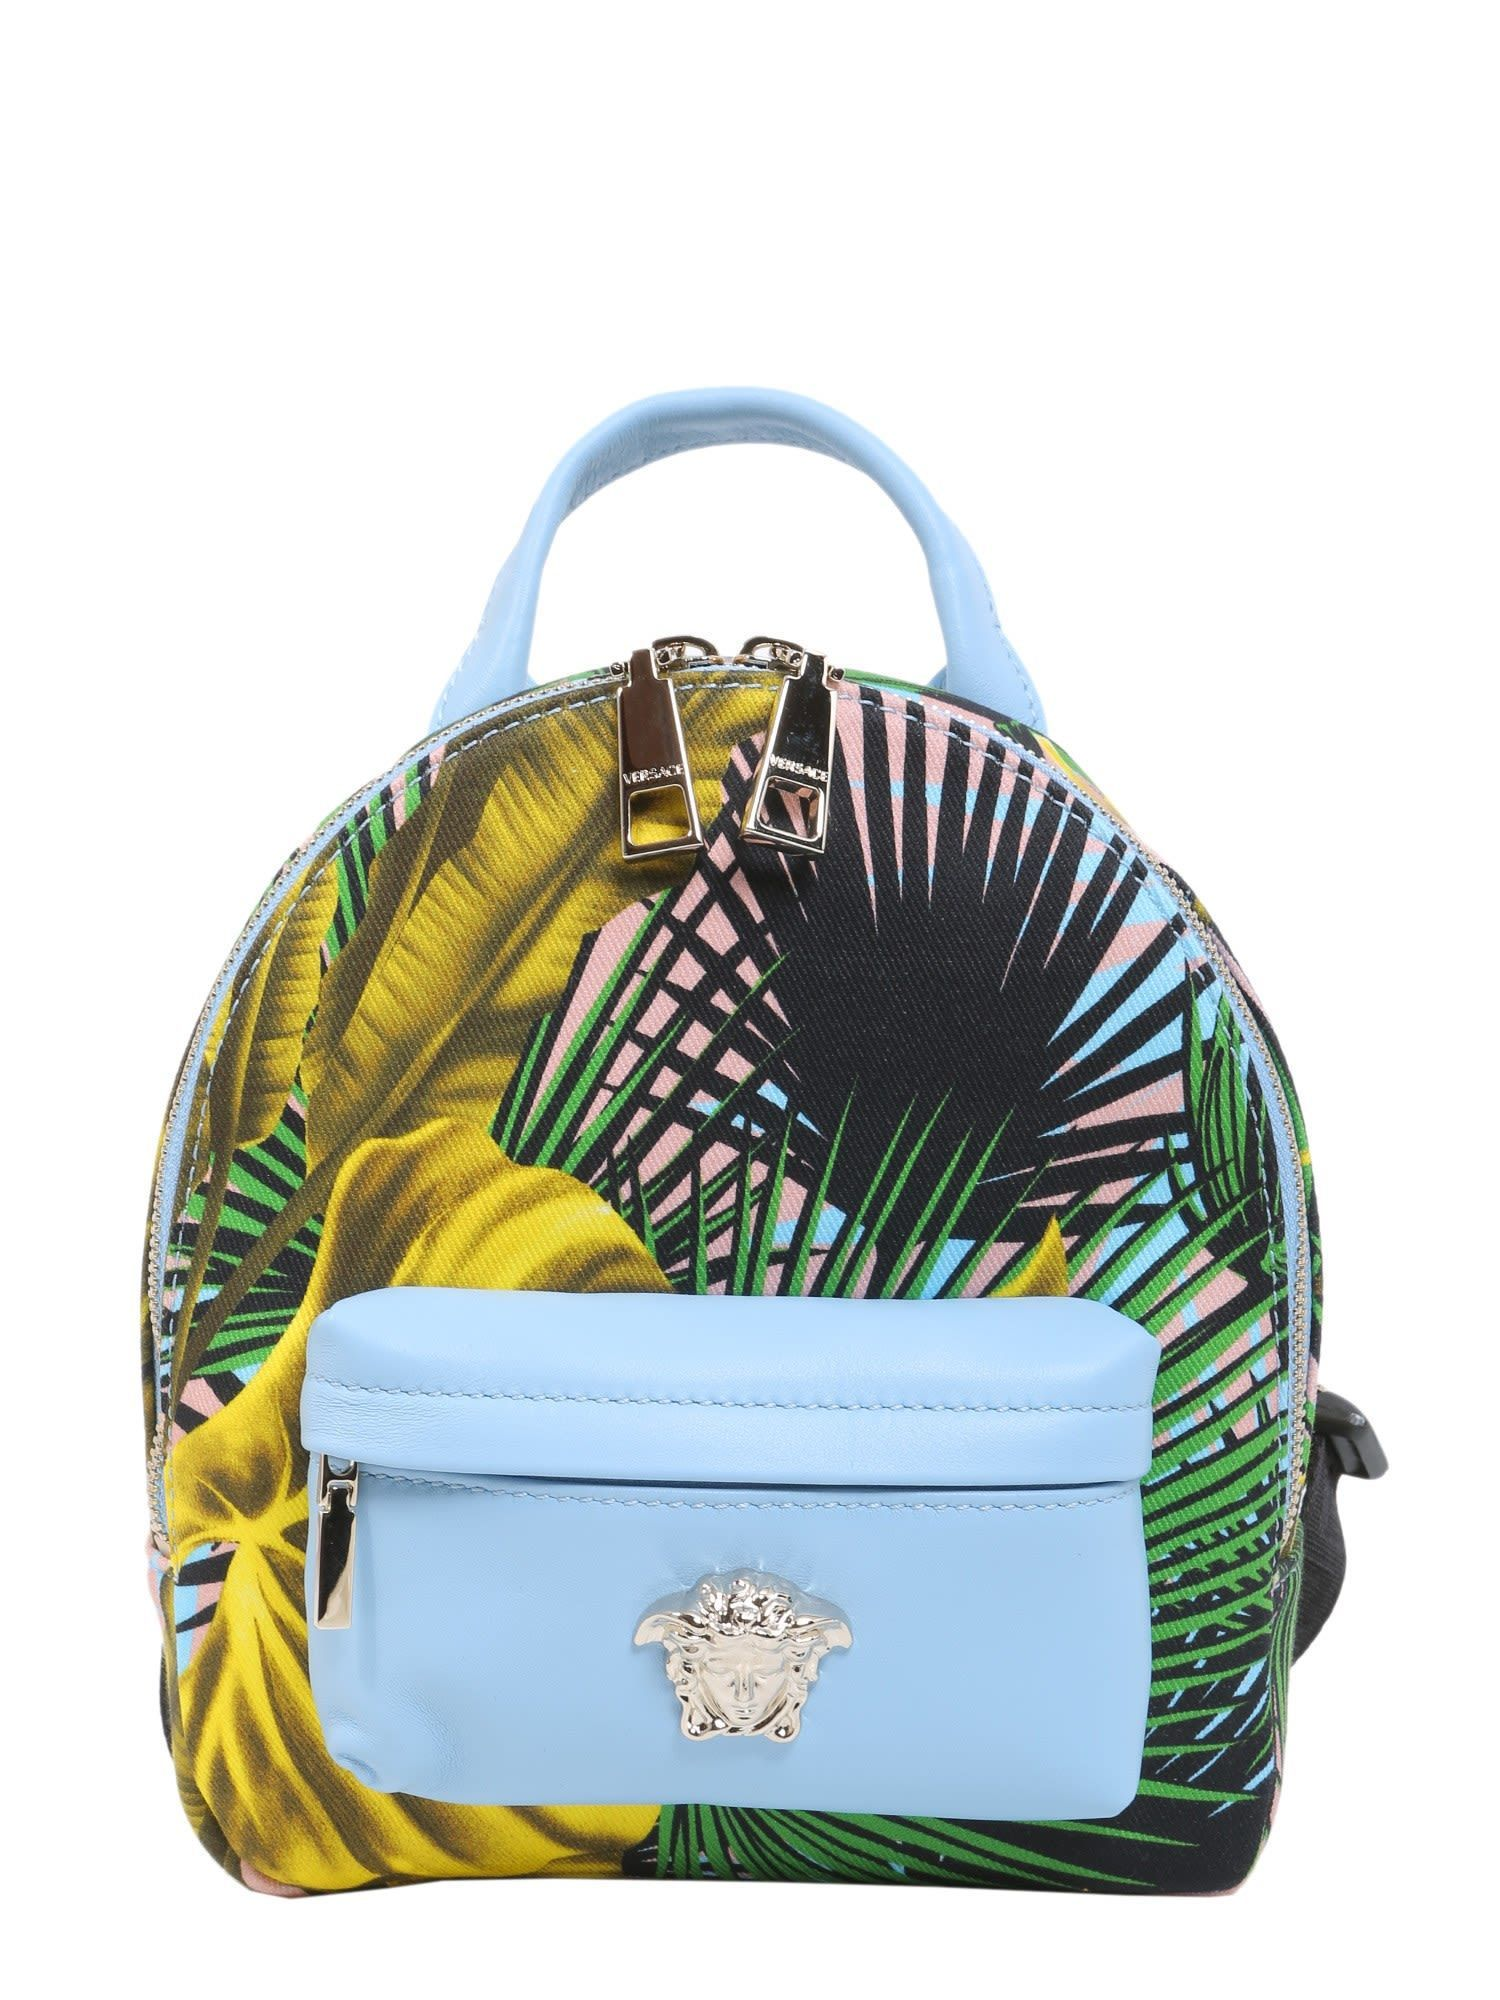 The new it bag is here its so cute bags mini